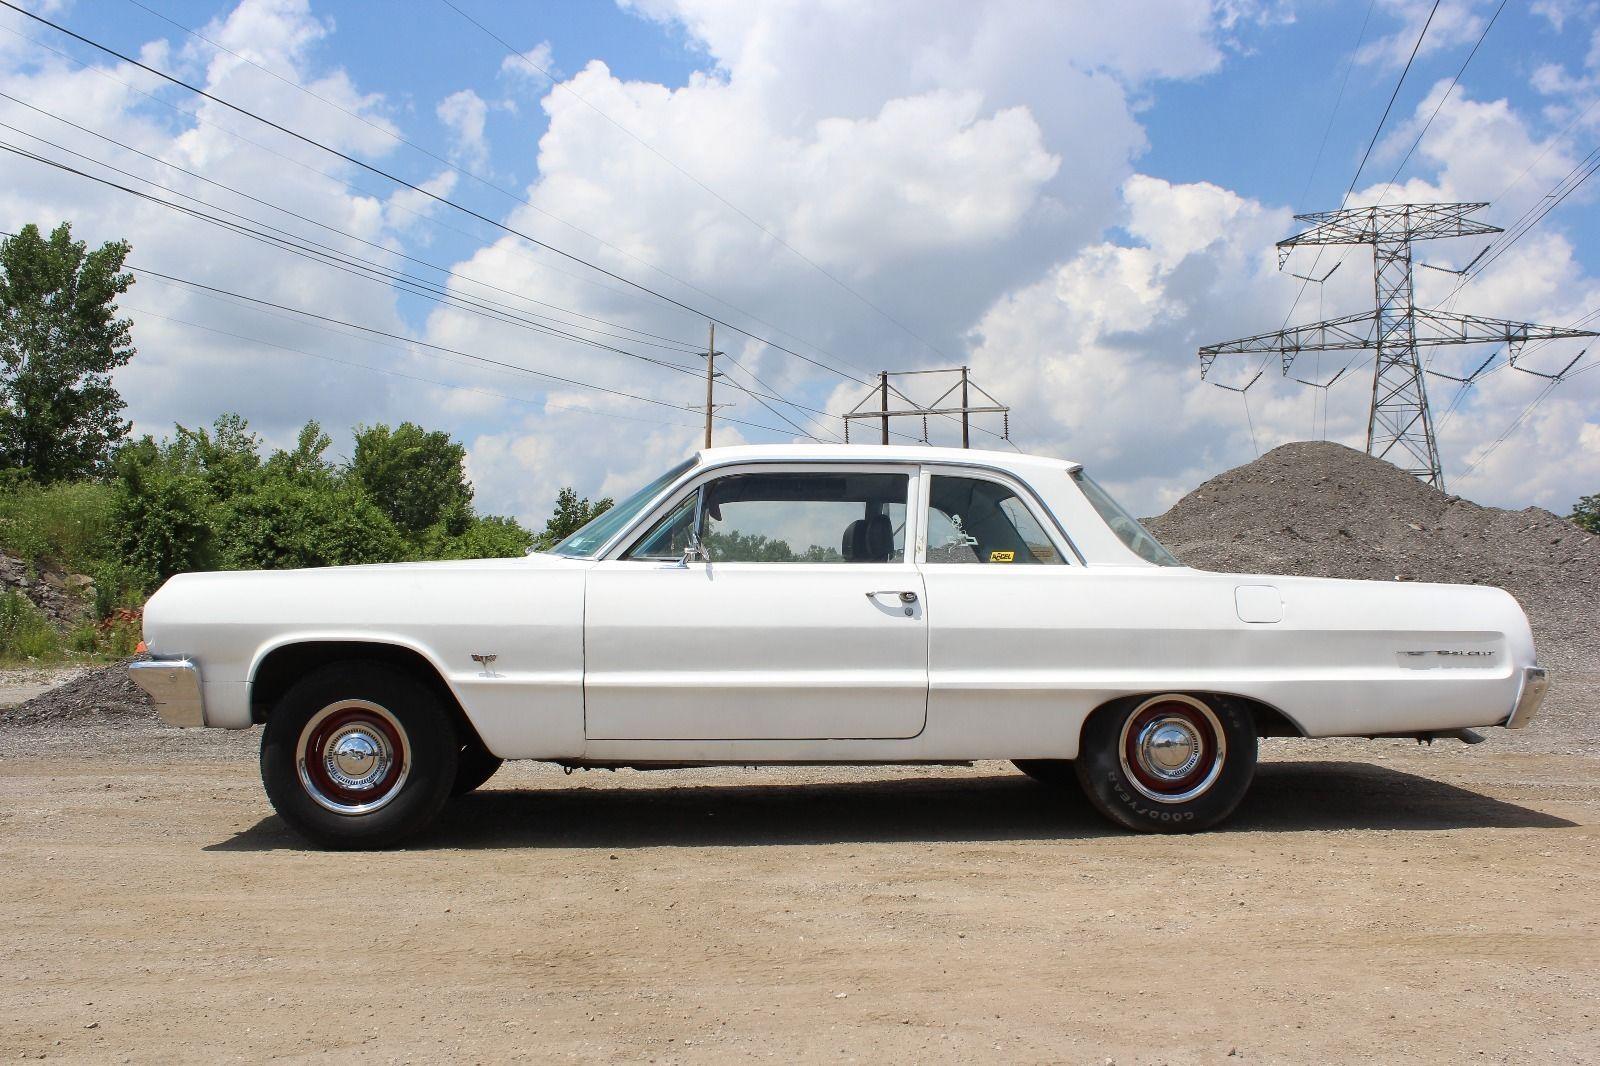 Chevrolet: Impala Bel Air 1964 bel air Check more at http://auctioncars.online/product/chevrolet-impala-bel-air-1964-bel-air/